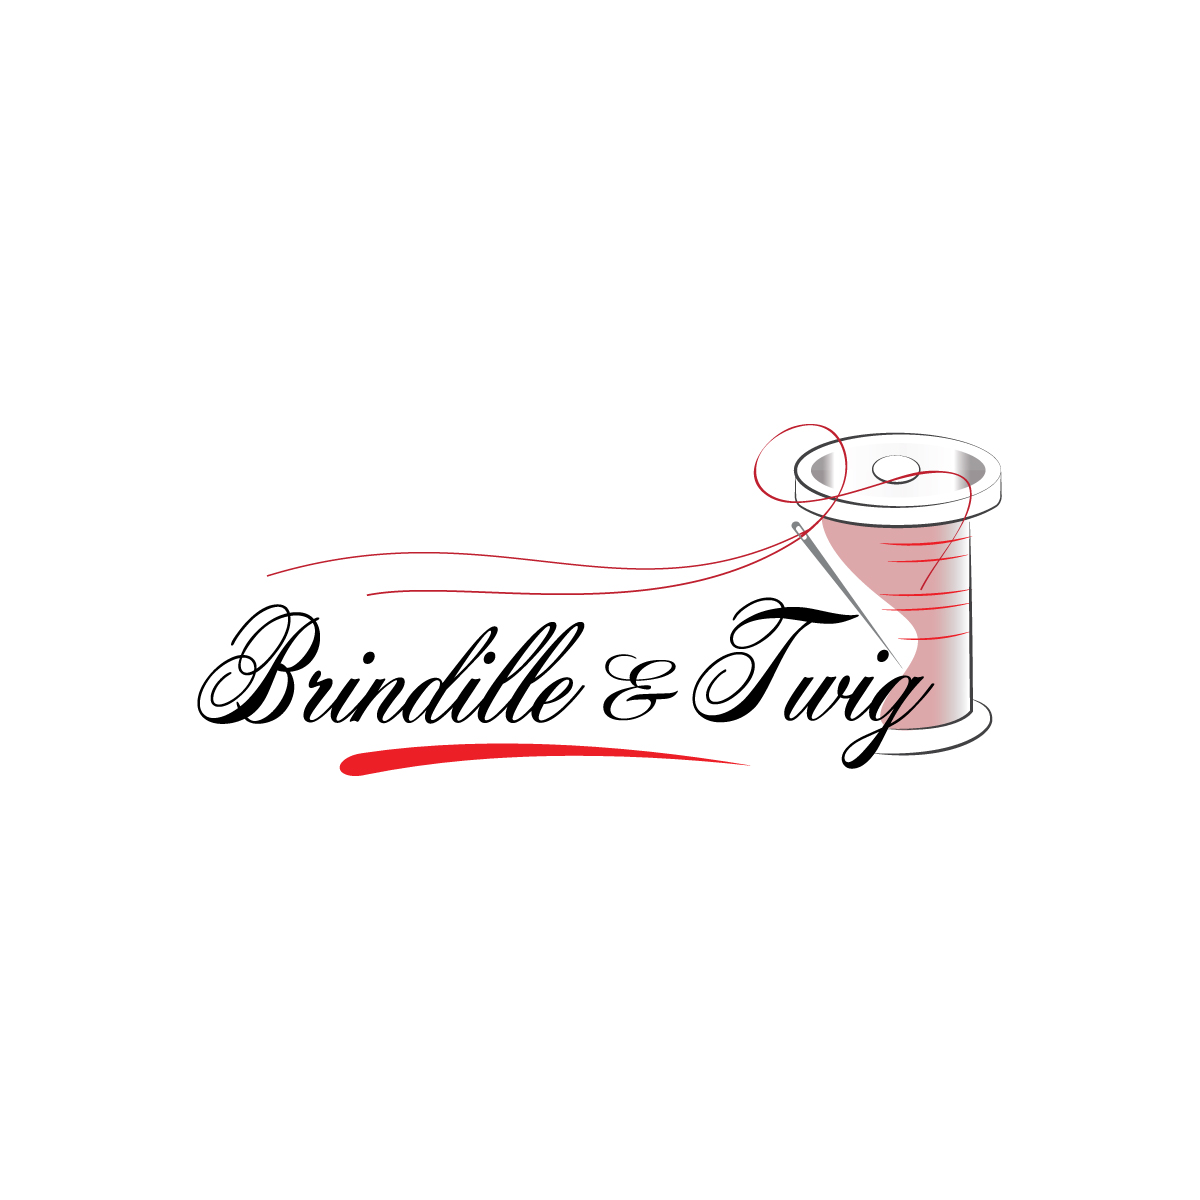 Logo Design by danelav - Entry No. 56 in the Logo Design Contest Logo Design for Brindille & Twig.